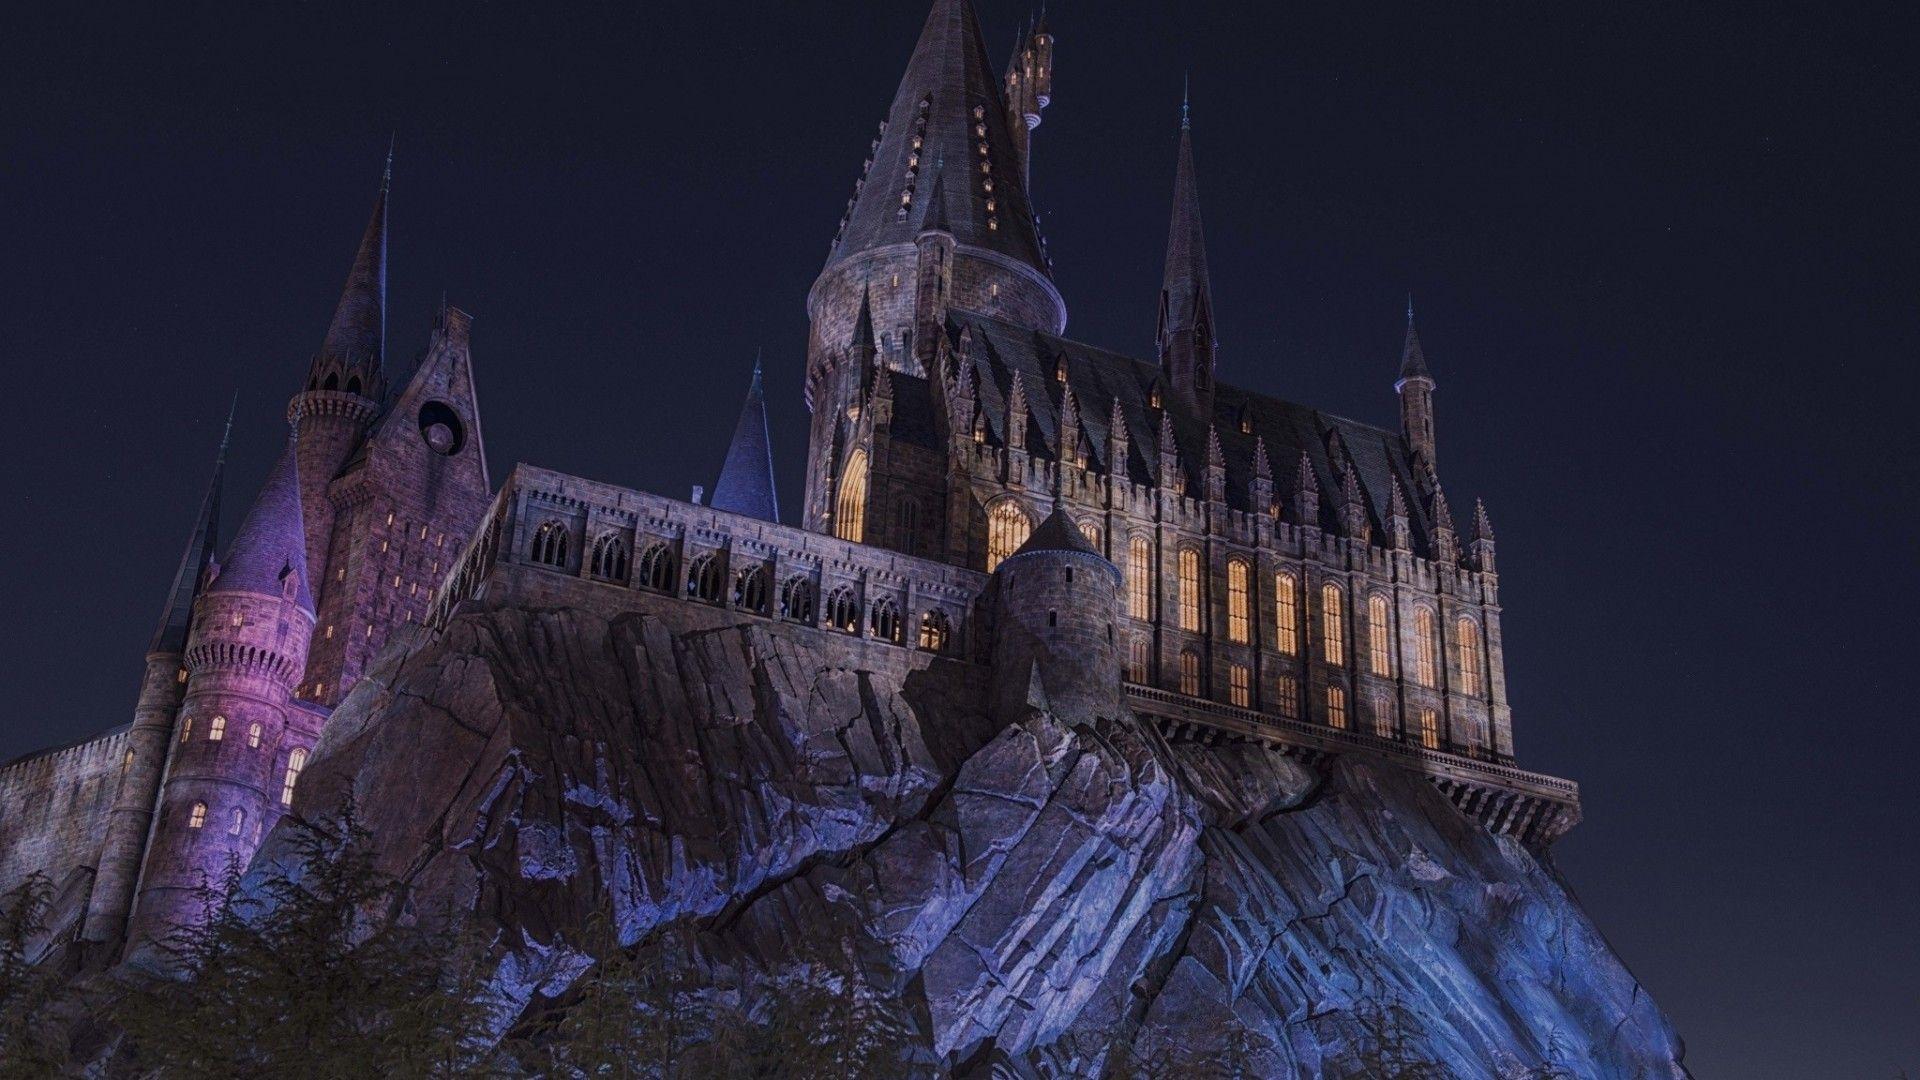 Hogwarts Desktop Wallpapers Top Free Hogwarts Desktop